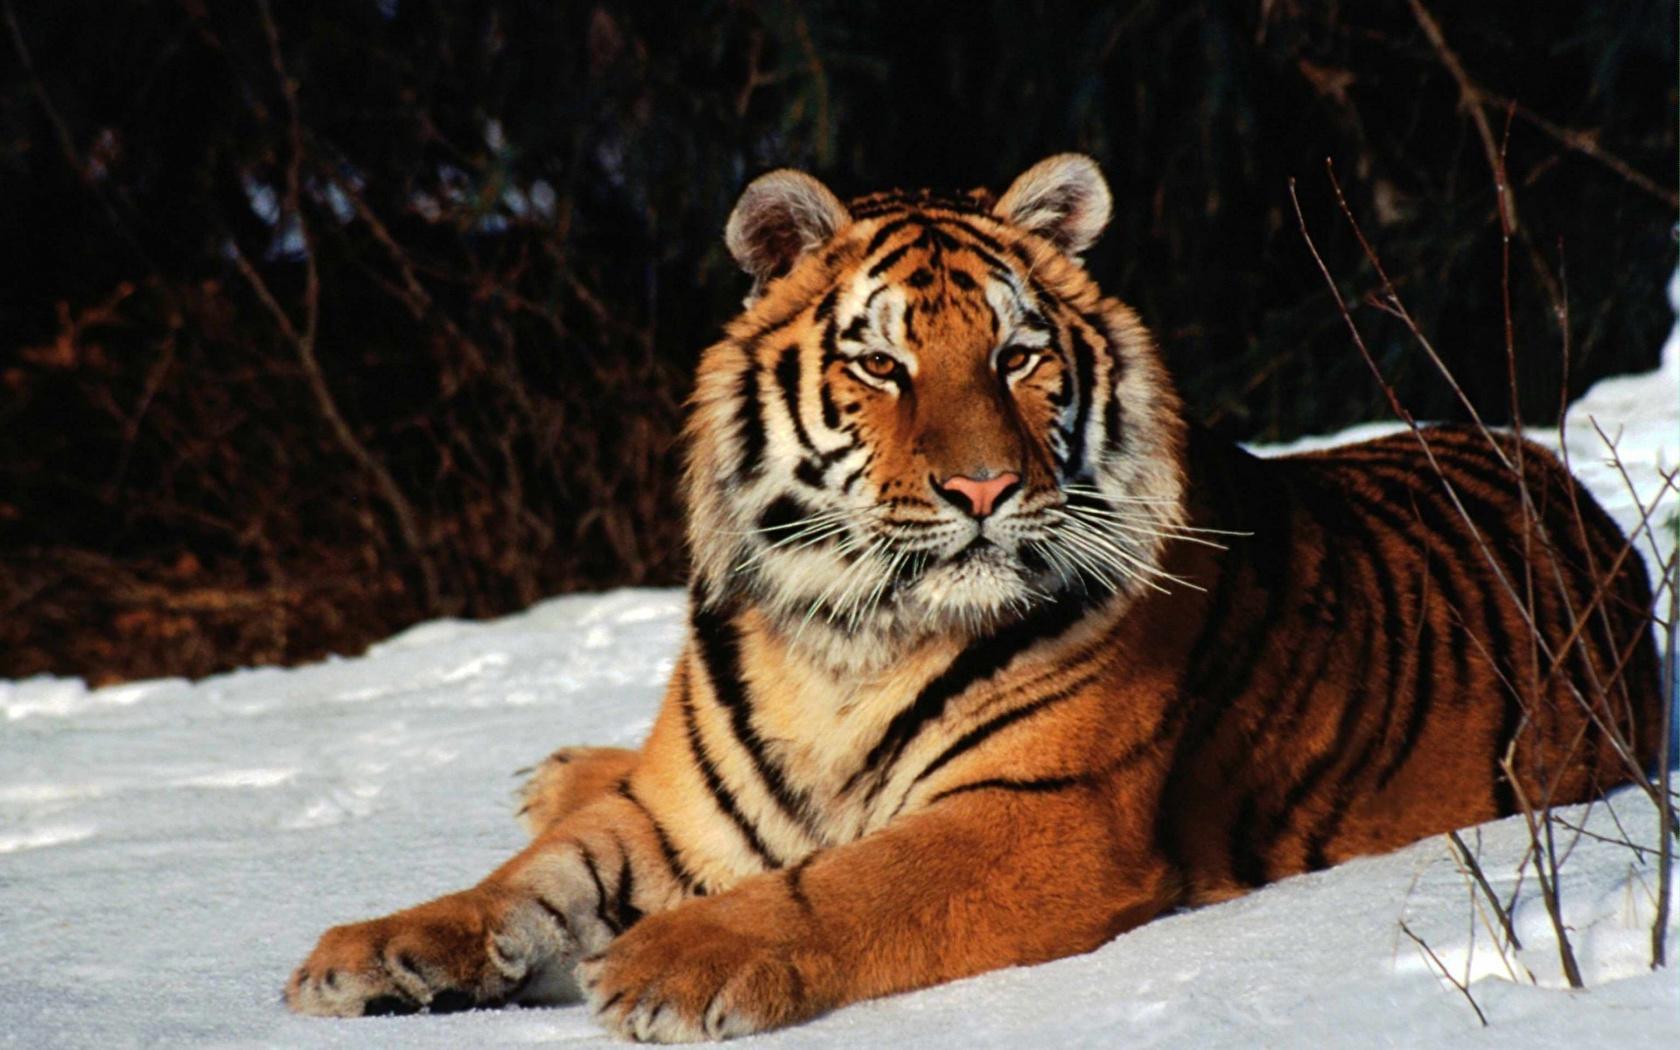 Уссурийский тигр среда обитания